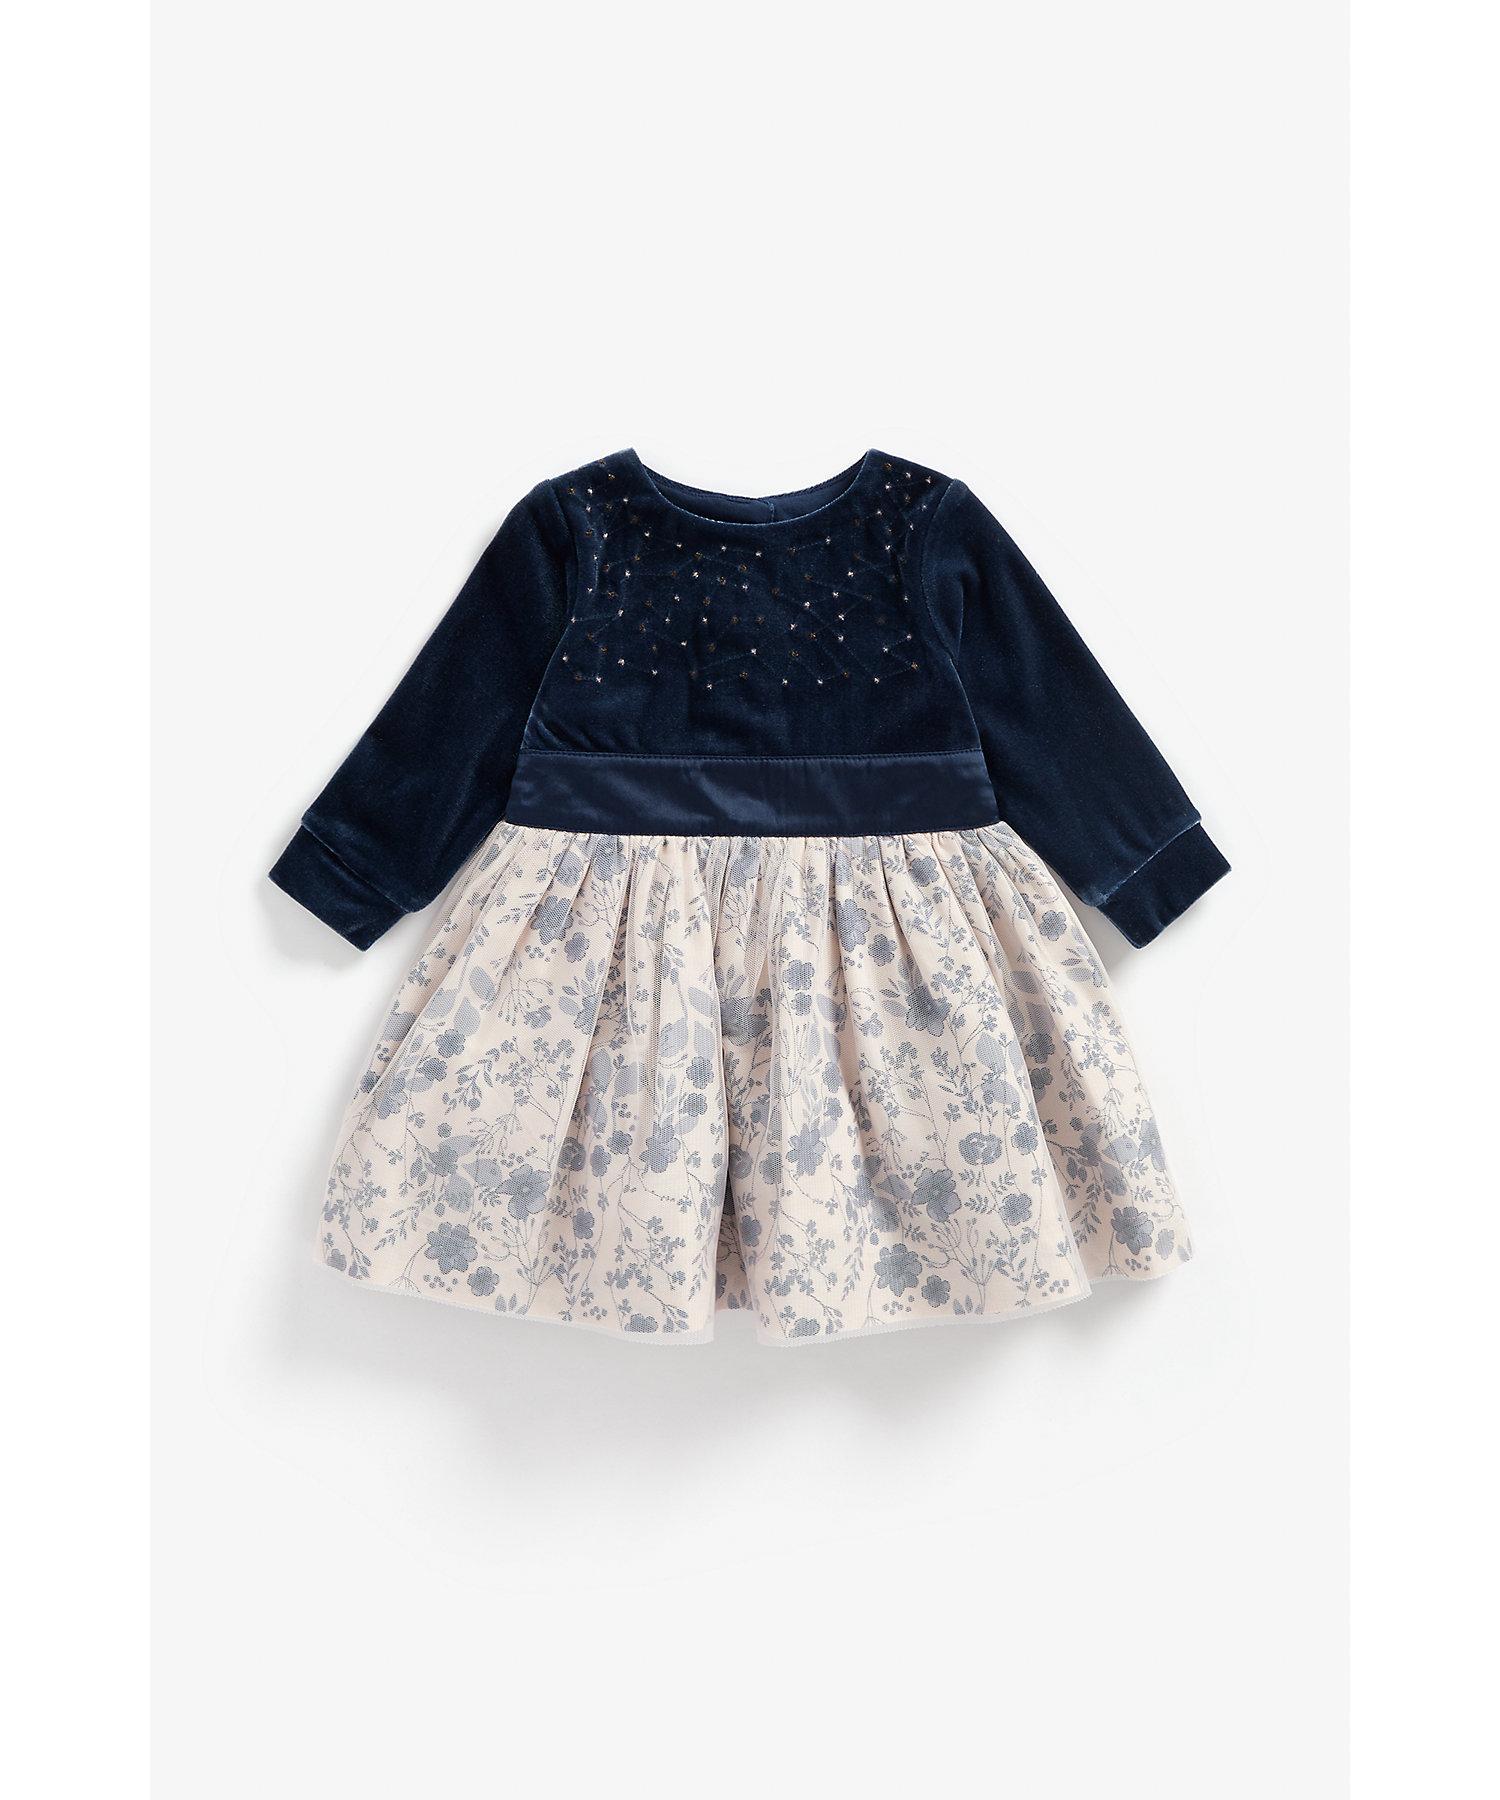 Mothercare | Girls Full Sleeves Velour Party Dress Sequin Detail - Navy